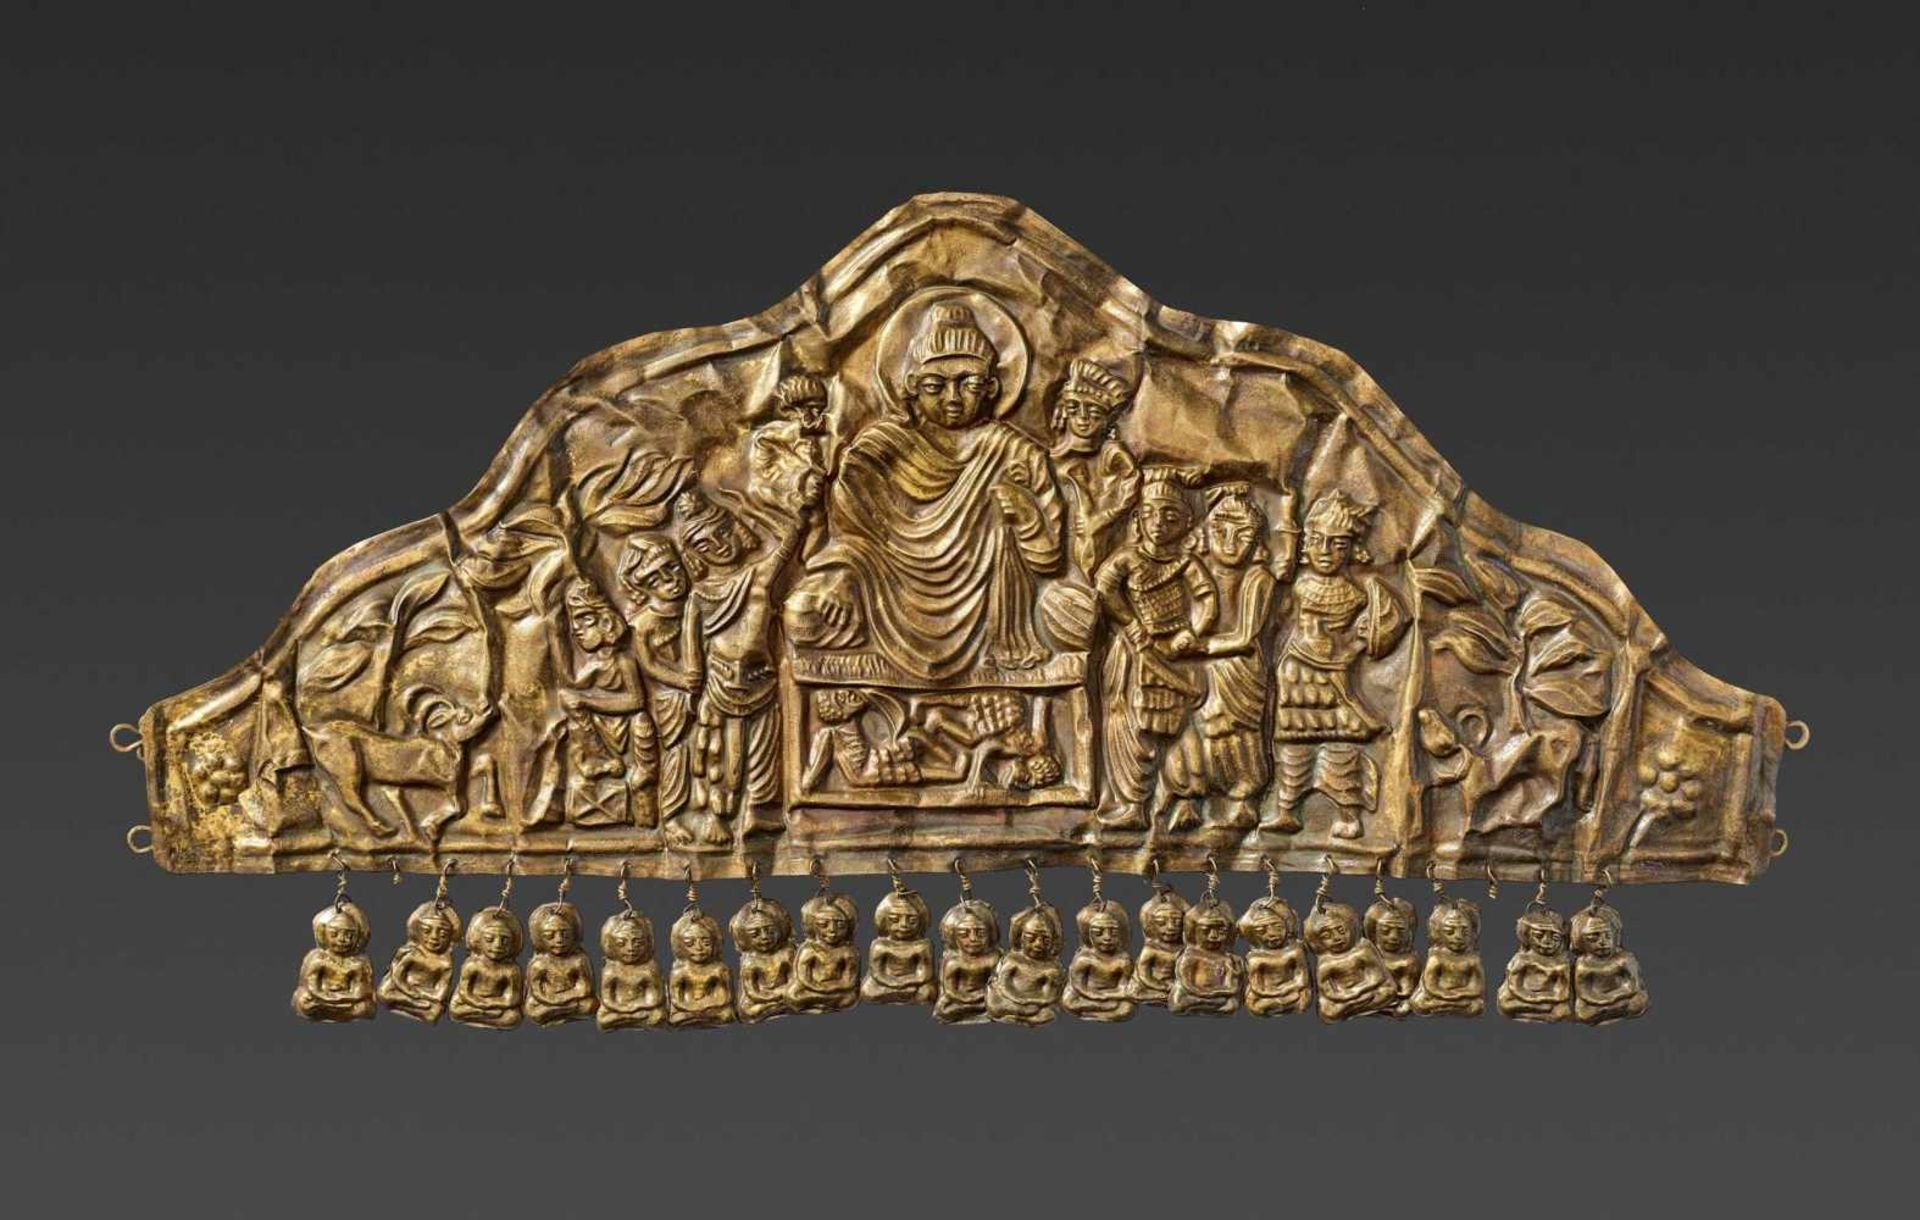 AN EXTREMELY RARE GANDHARAN GOLD DIADEM DEPICTING BUDDHA DEFYING MARA